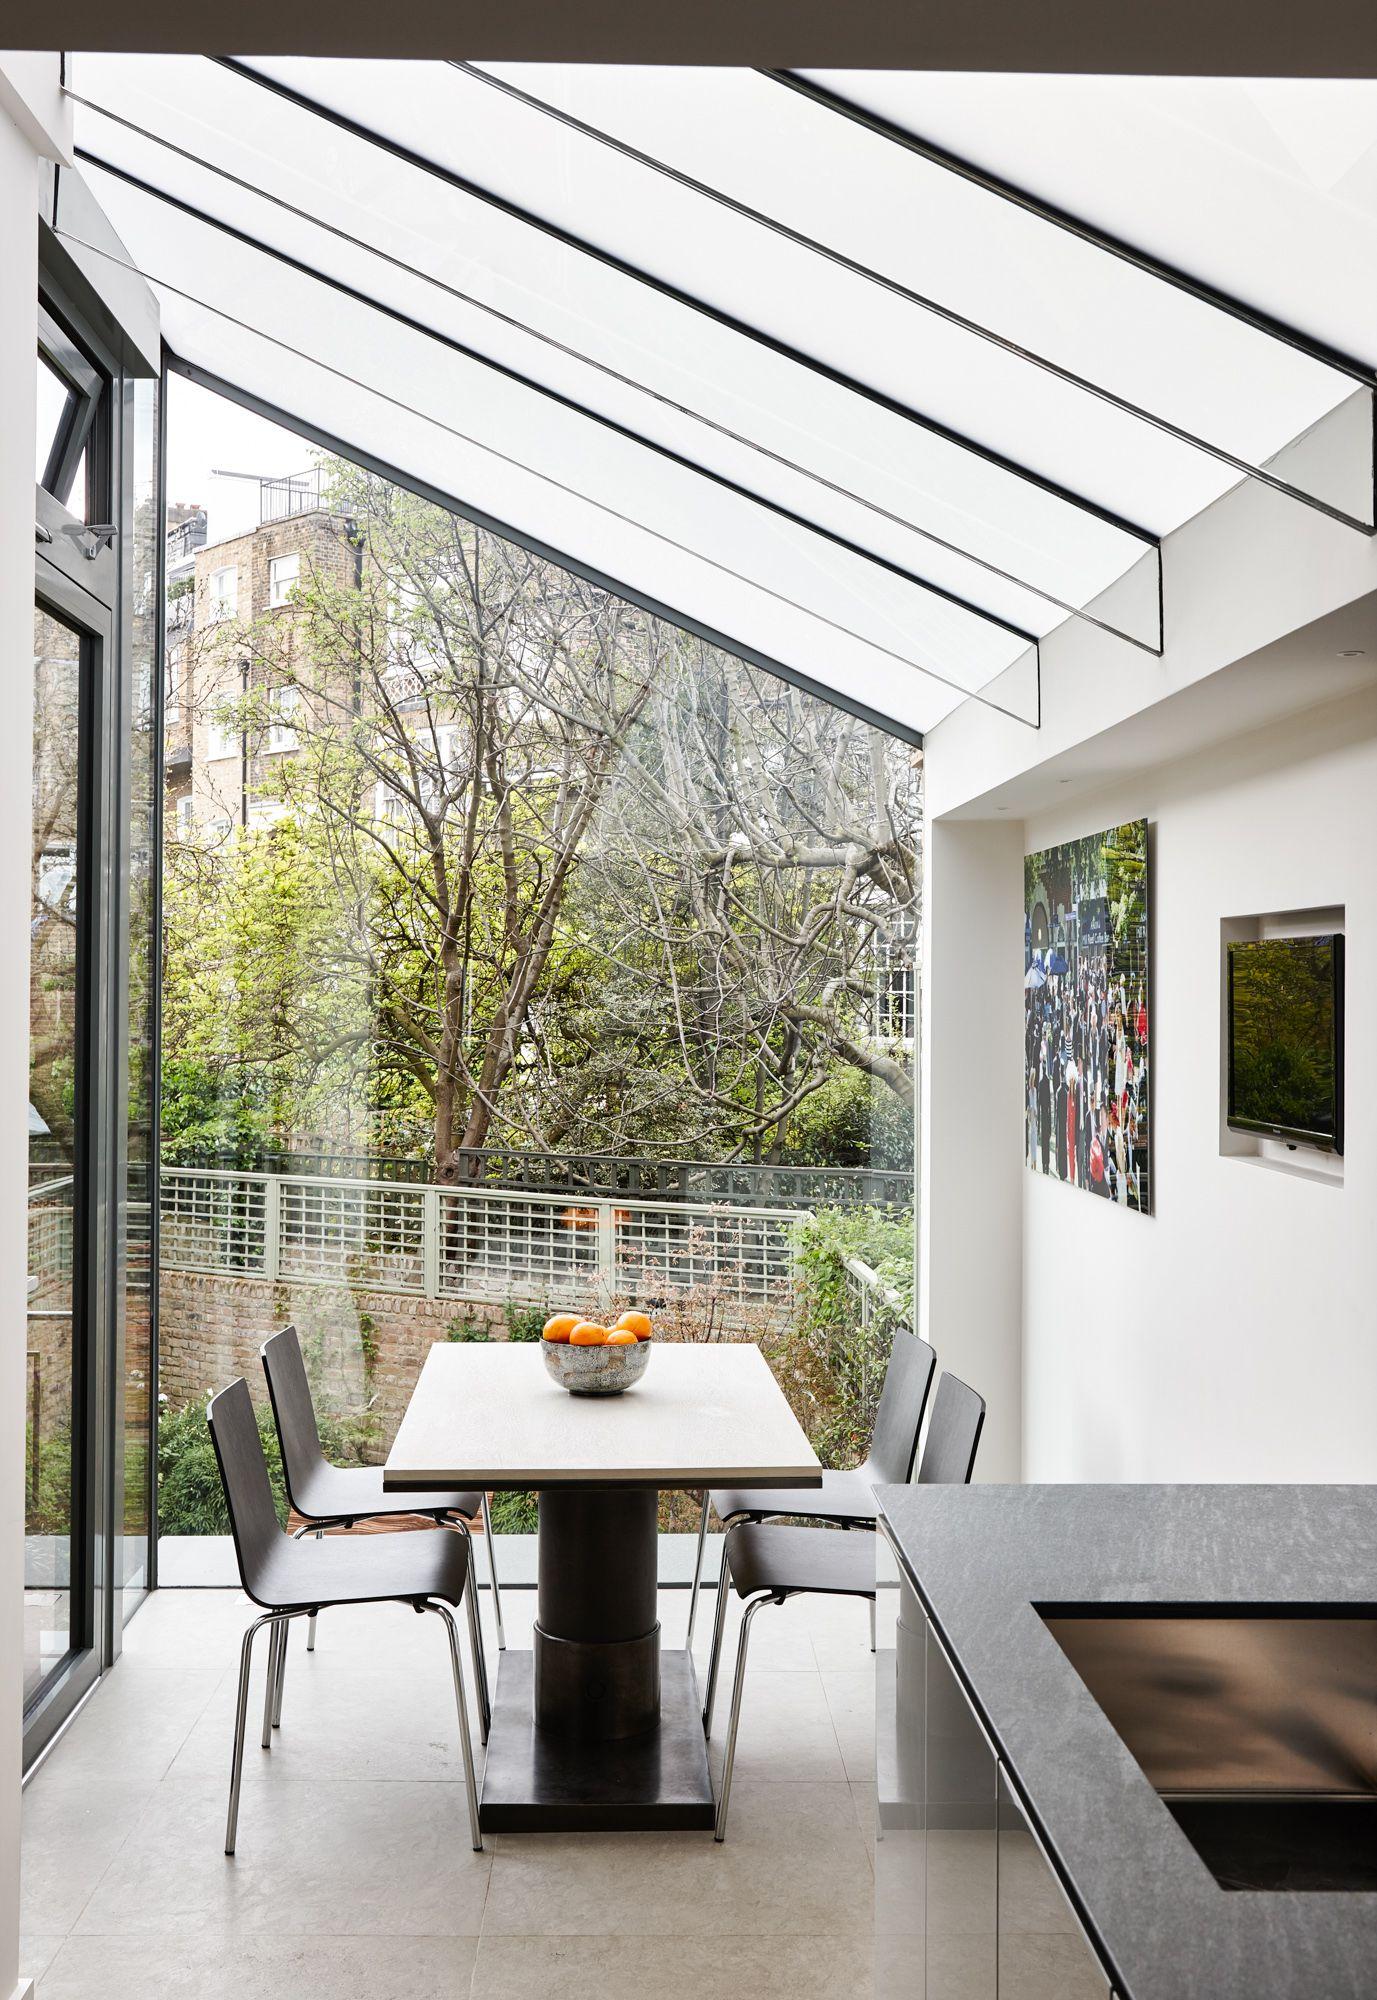 Best Trombe Internal Photo Of Structurally Glazed Modern 640 x 480